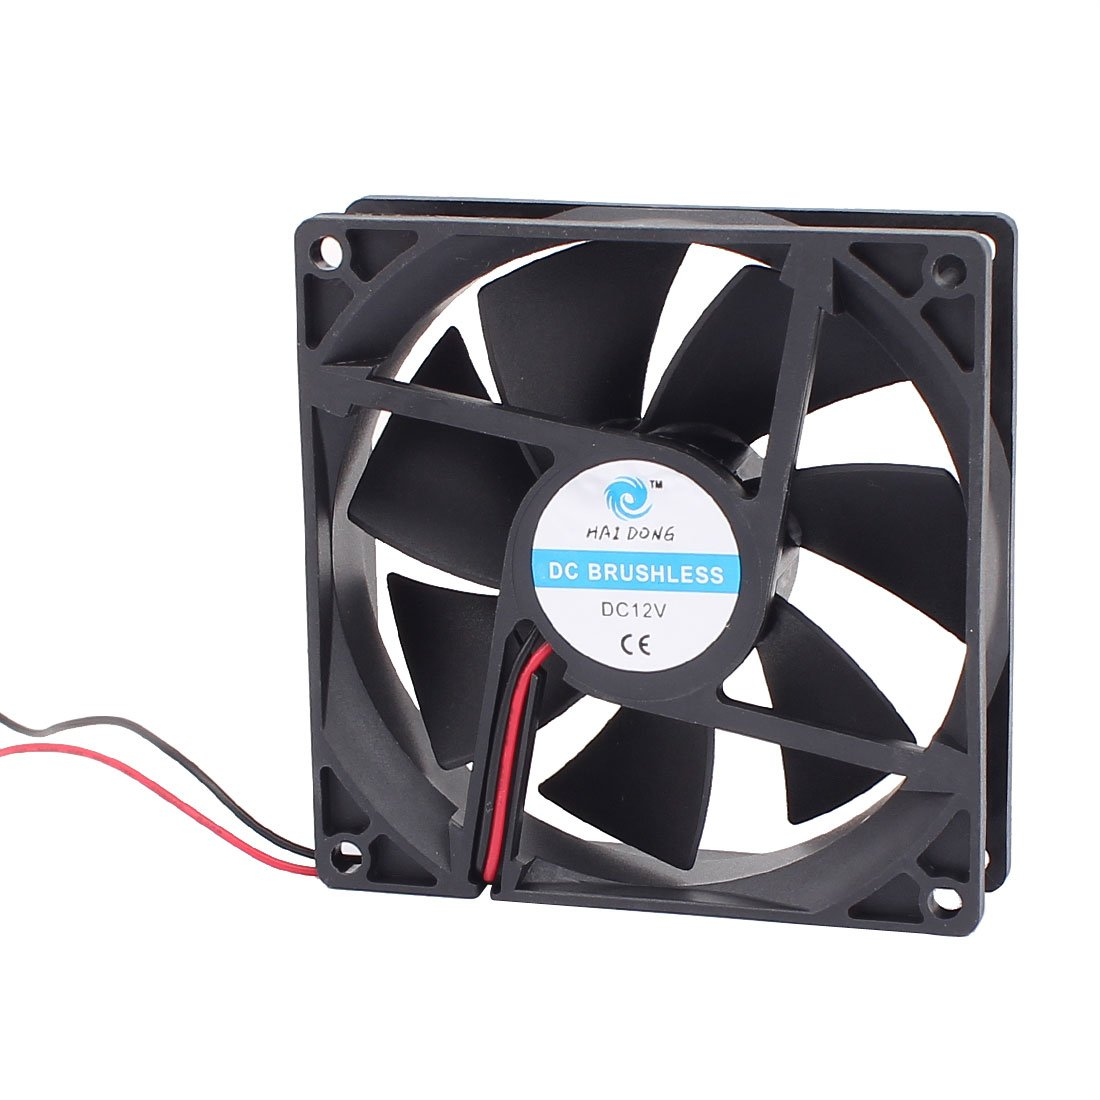 uxcell a16030800ux1099 DC 12V 90mmx90mmx 25mm 7 Vanes Cooling Cooler Fan w Metal Finger Guard